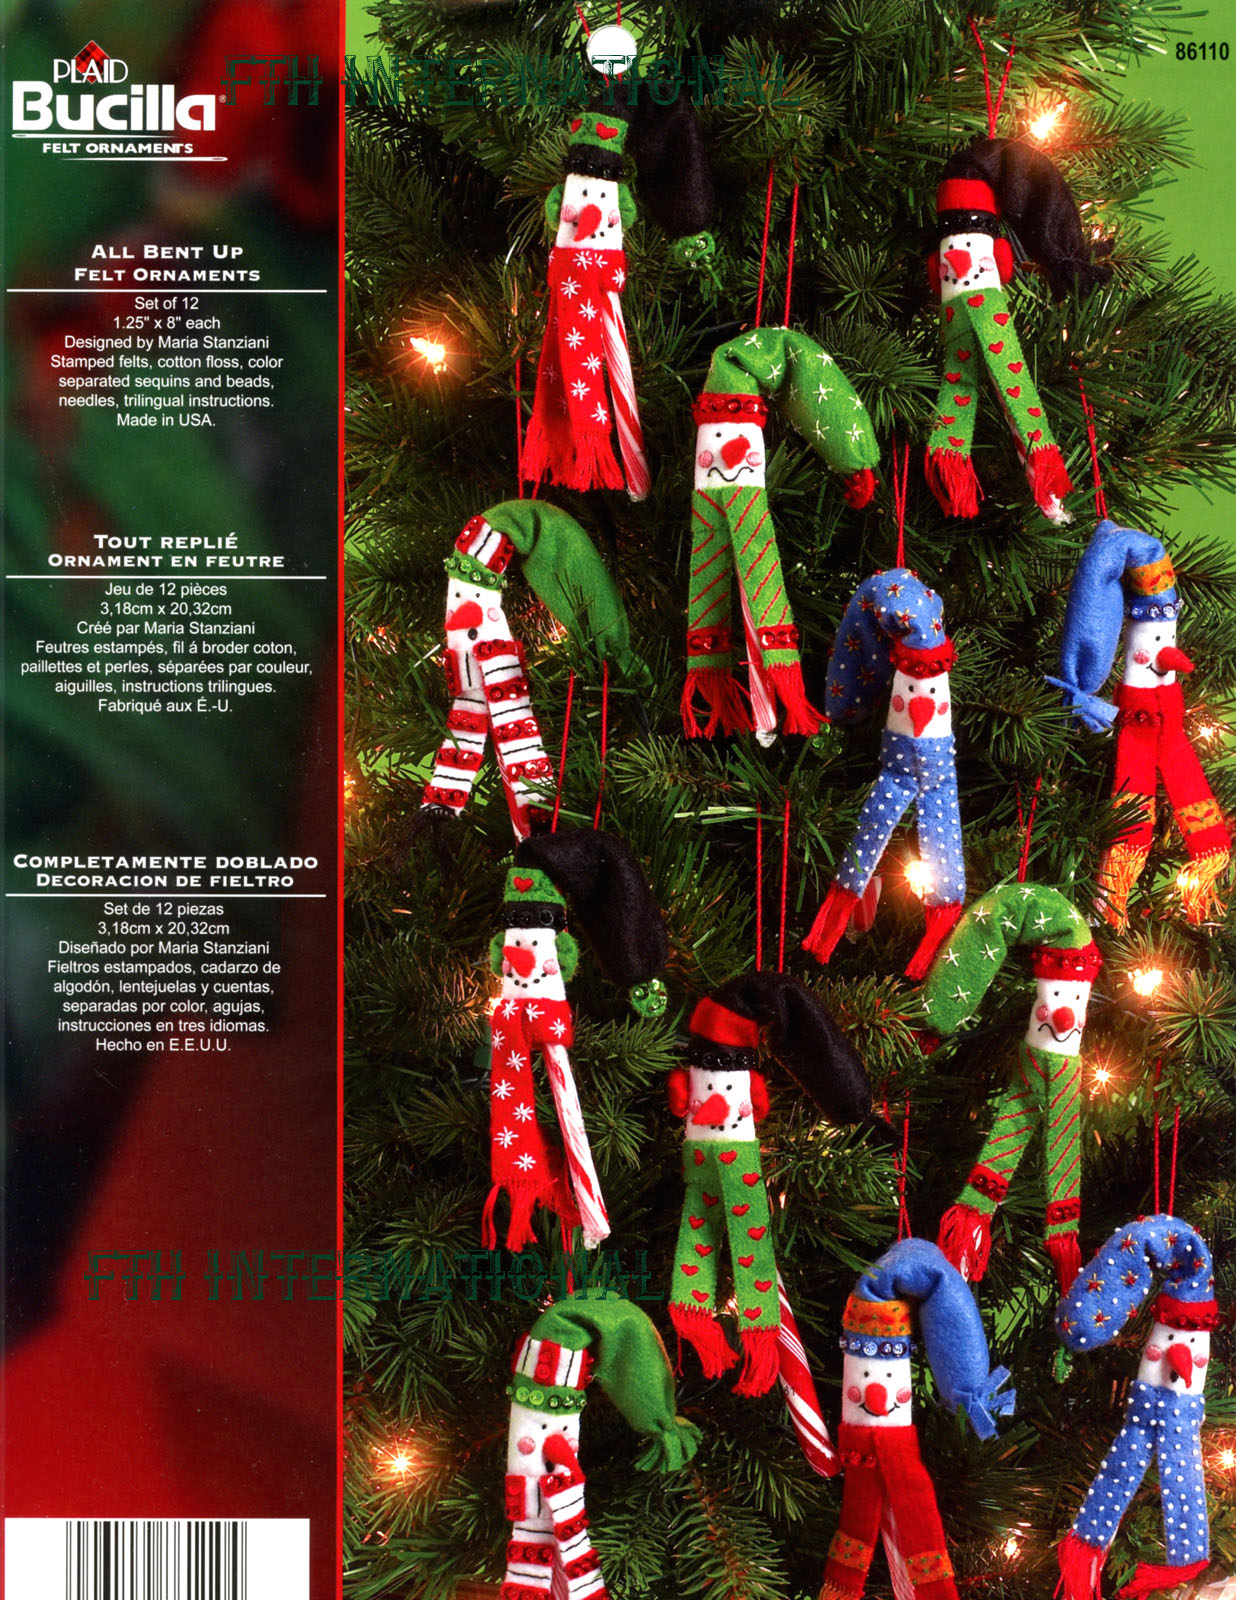 Bucilla All Bent Up 12 Pce Felt Christmas Ornament Kit 86110 Snowmen Candy Cane